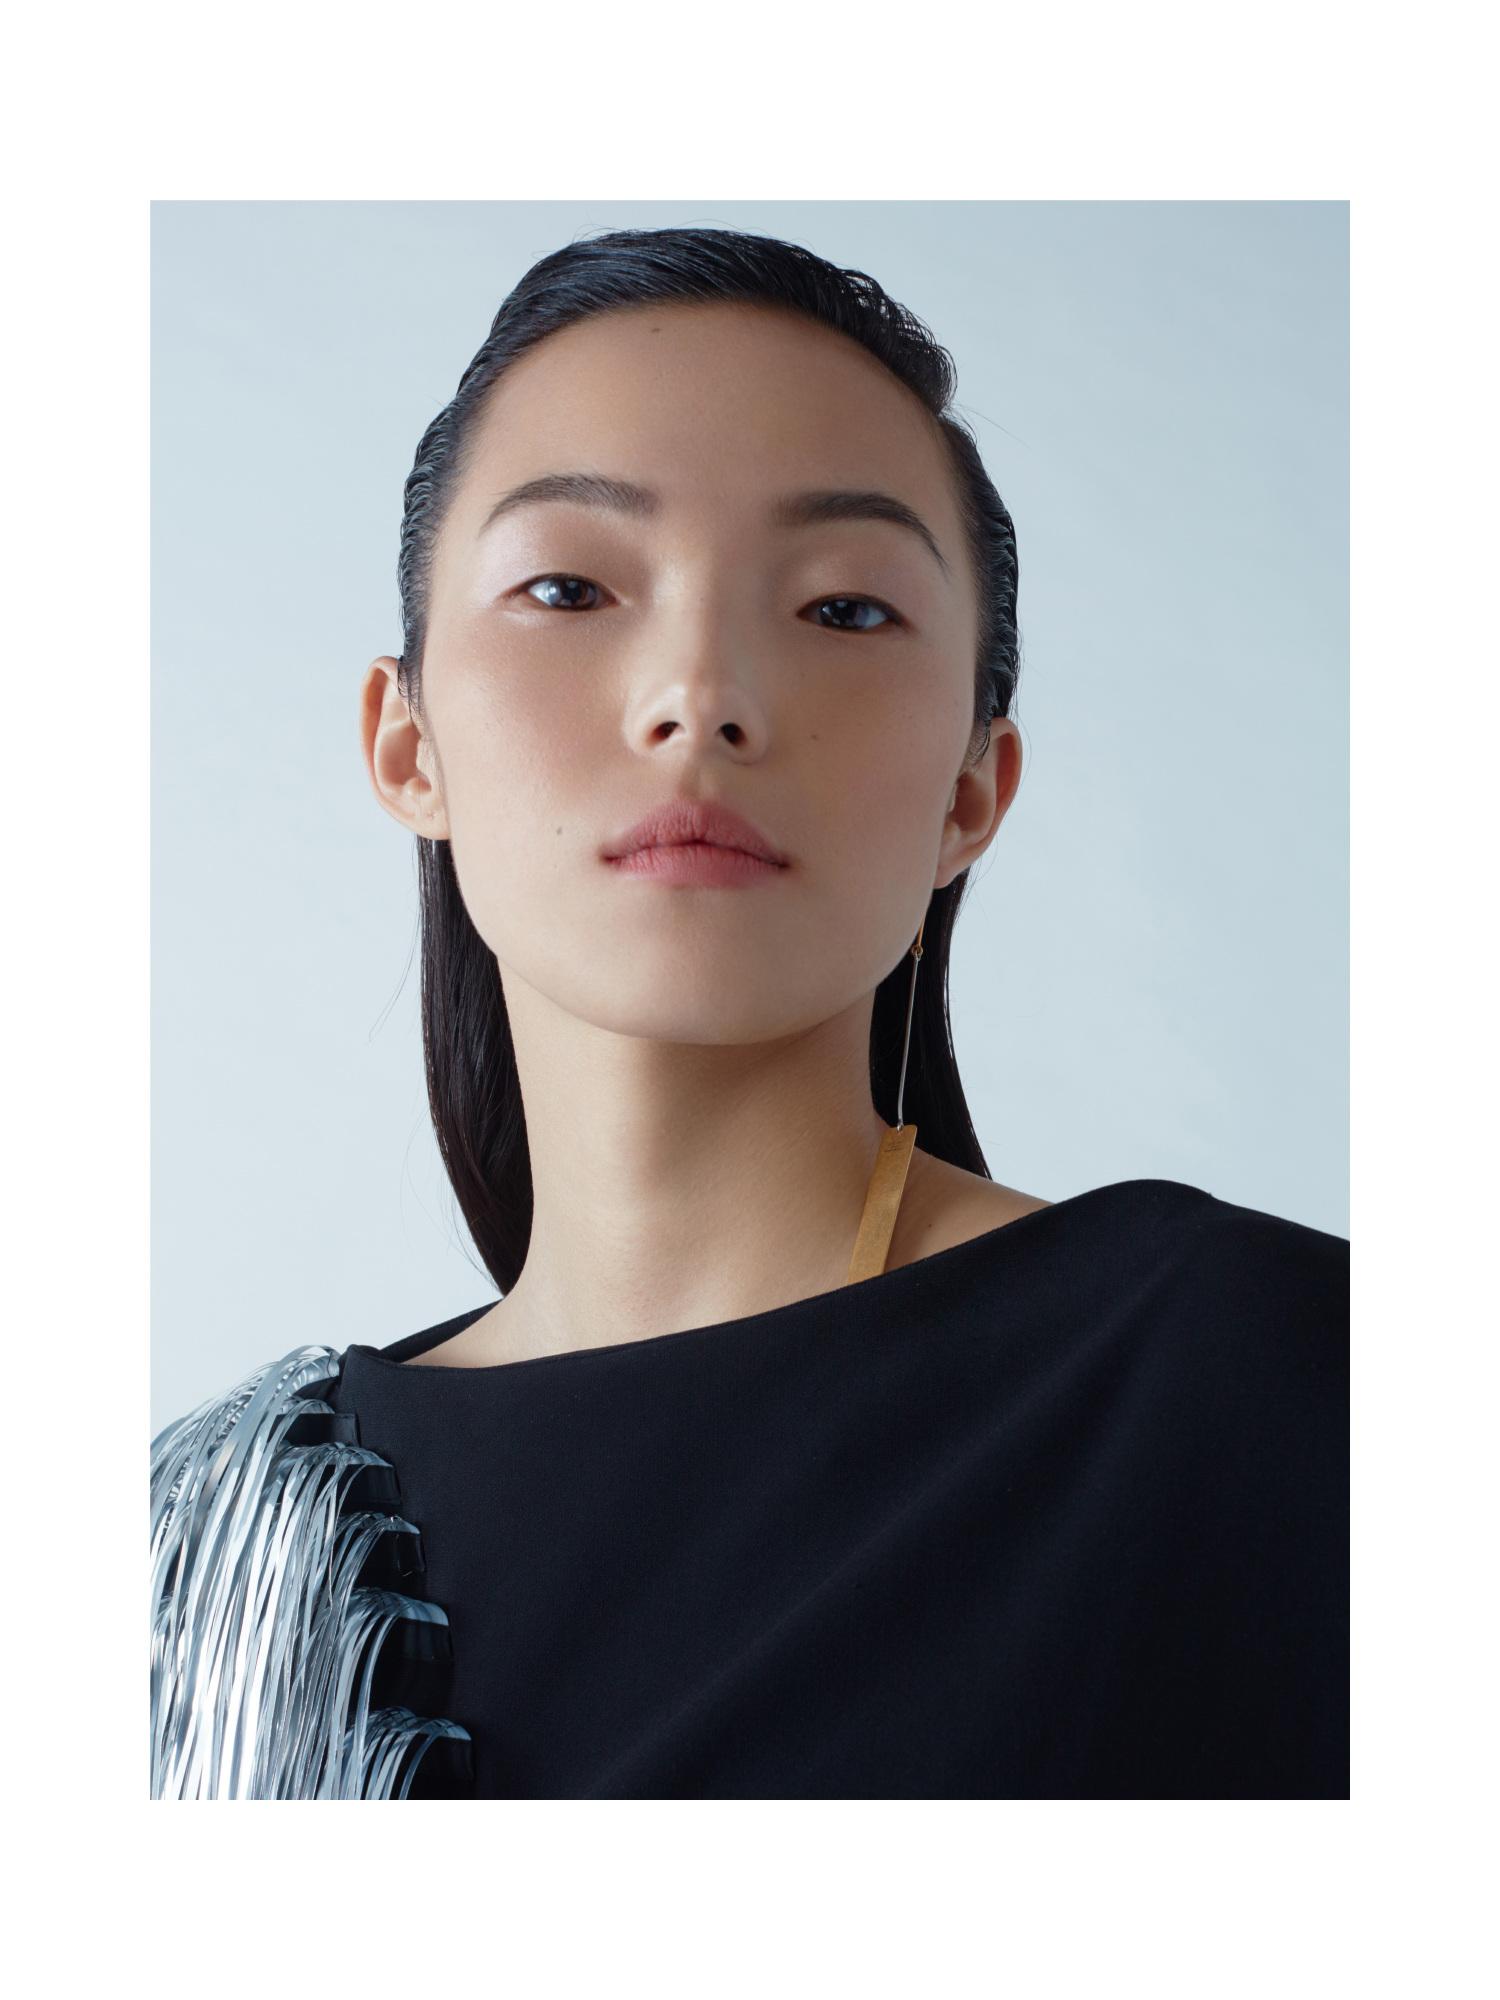 Xiao Wen Ju at Fendi Spring 2015 | Gisele, Cara, Kendall